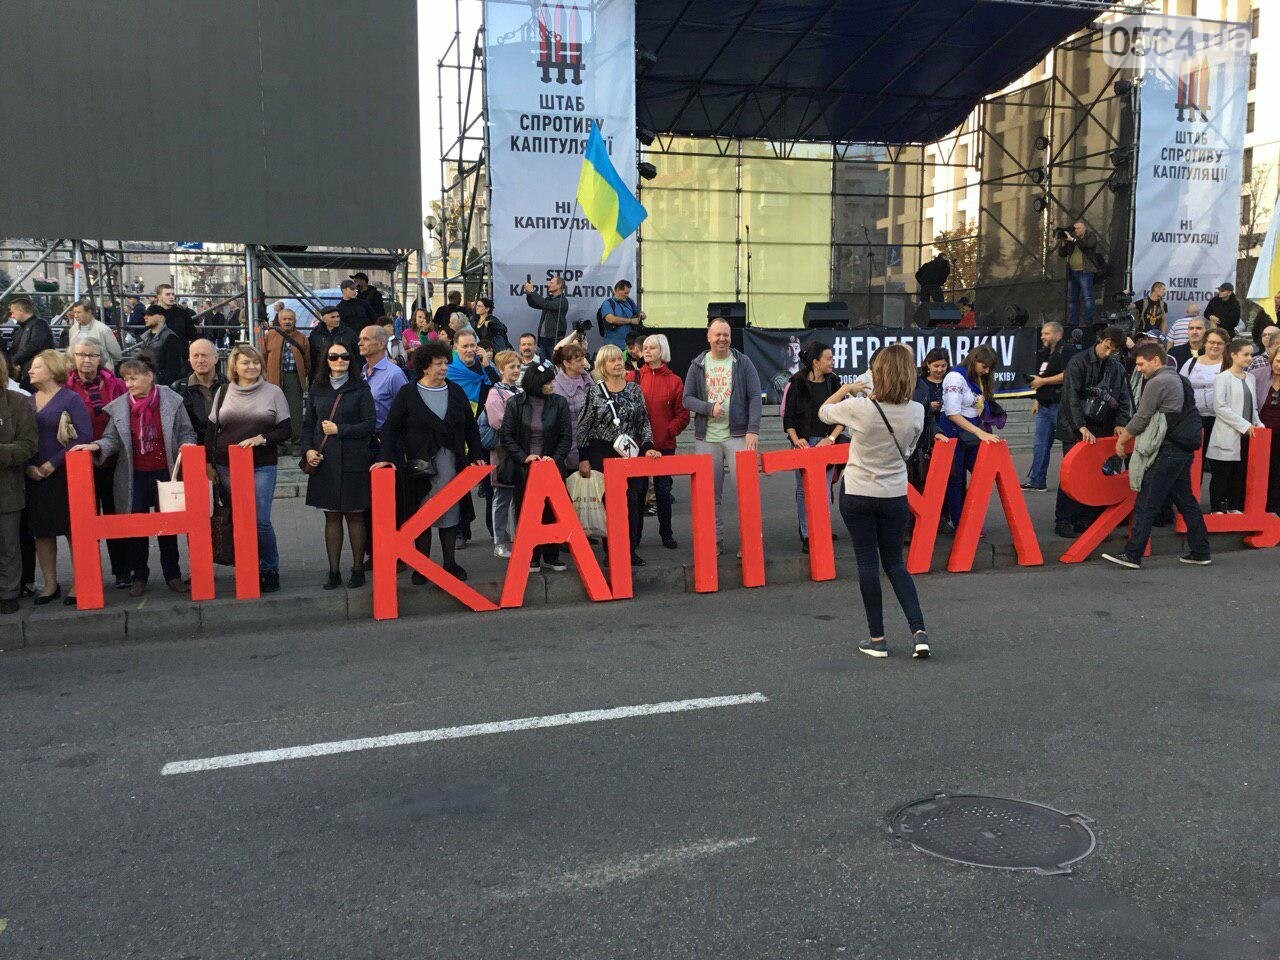 Криворожане поддержали Марш сопротивления капитуляции в Киеве, - ФОТО, ВИДЕО, ОБНОВЛЕНО, фото-6